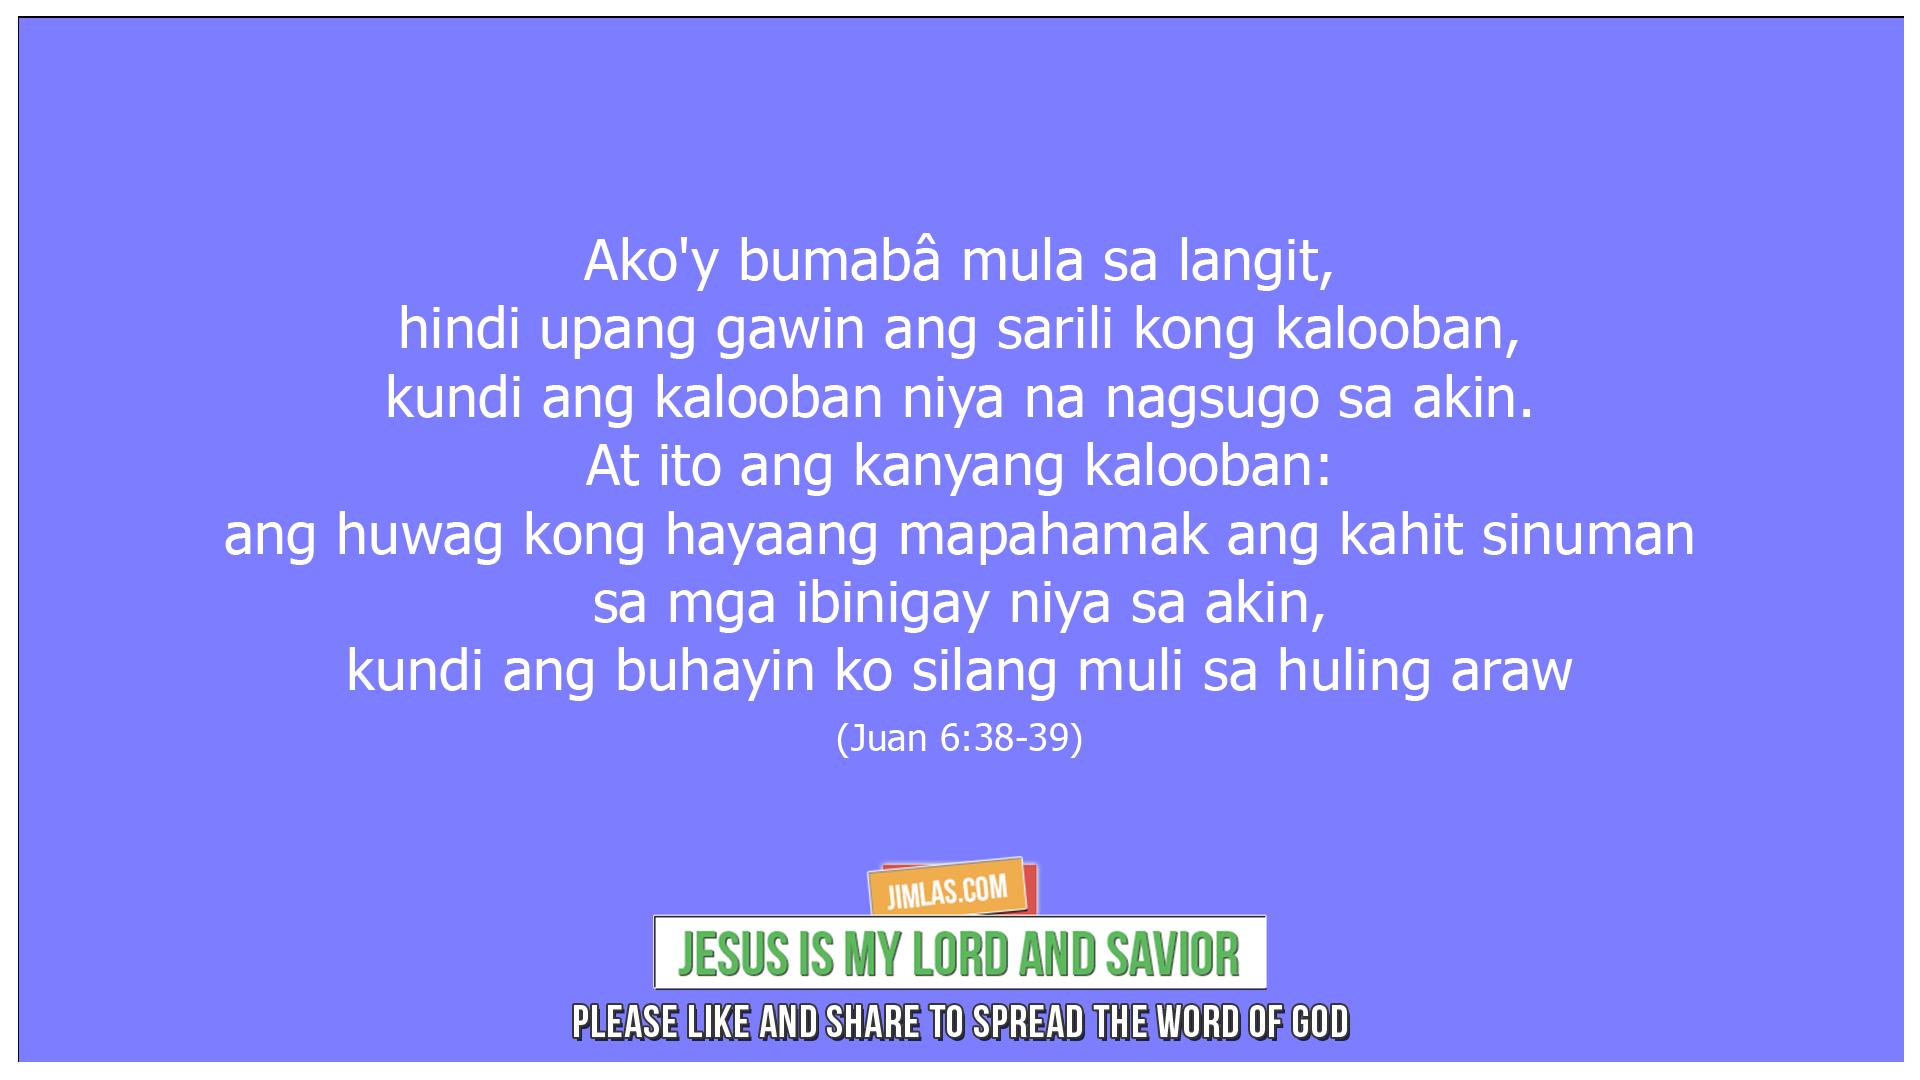 Juan 6 38-39, Juan 6:38-39